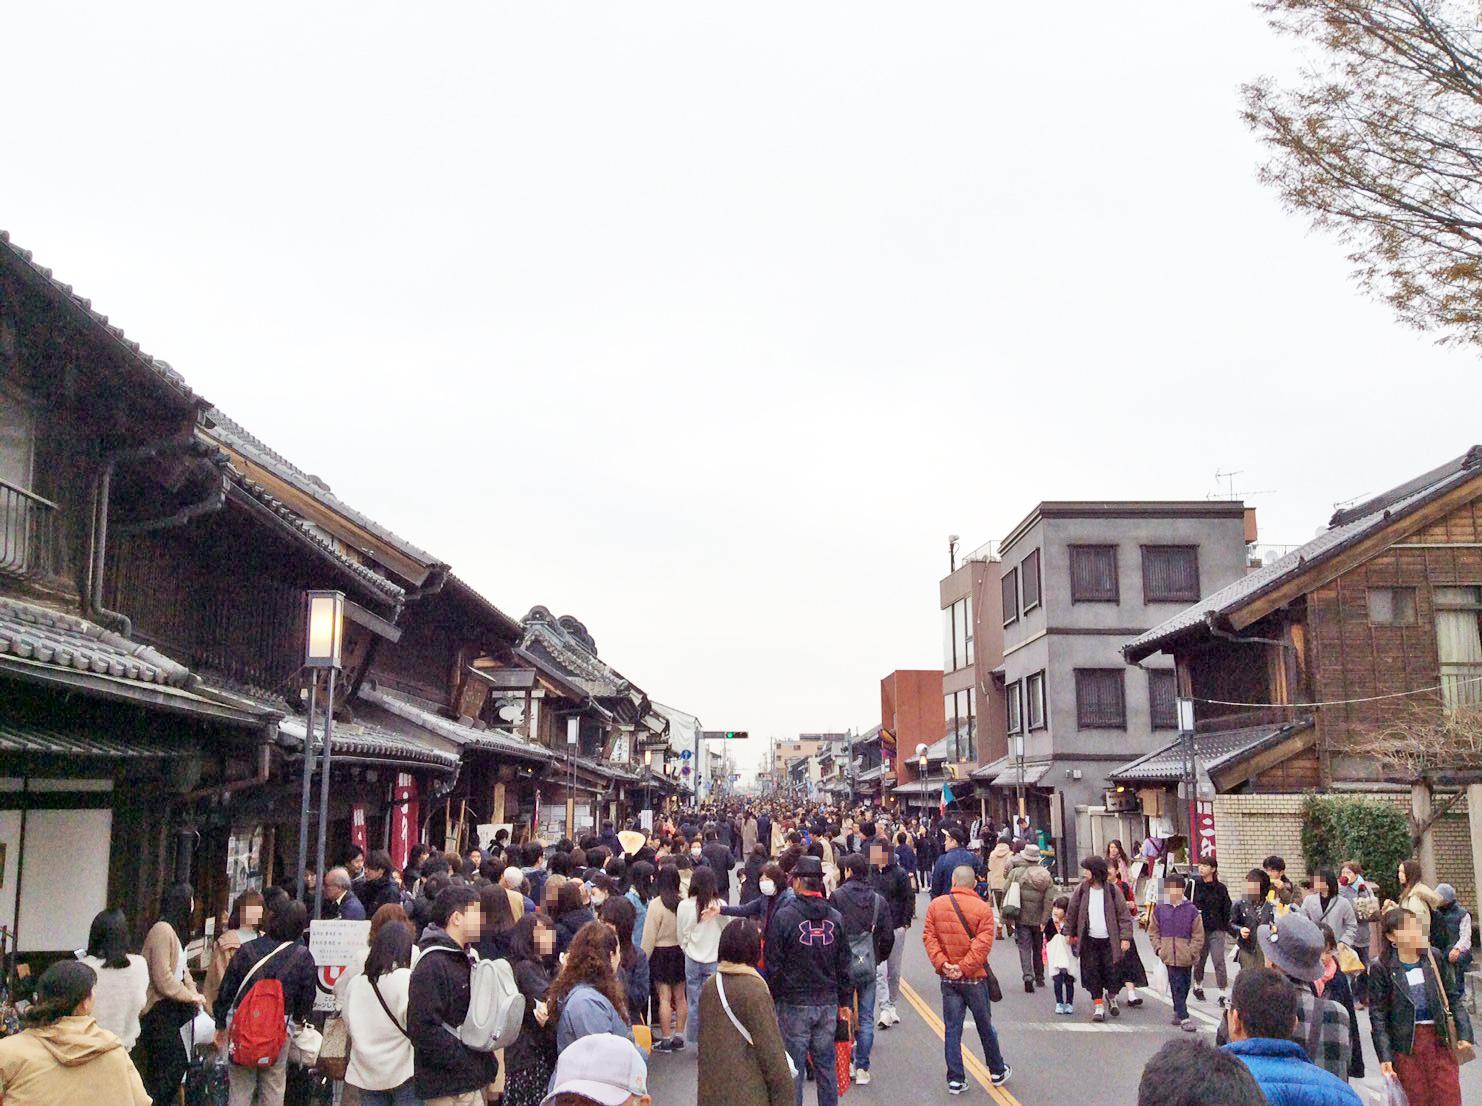 Normally Ichiban-gai in the daytime